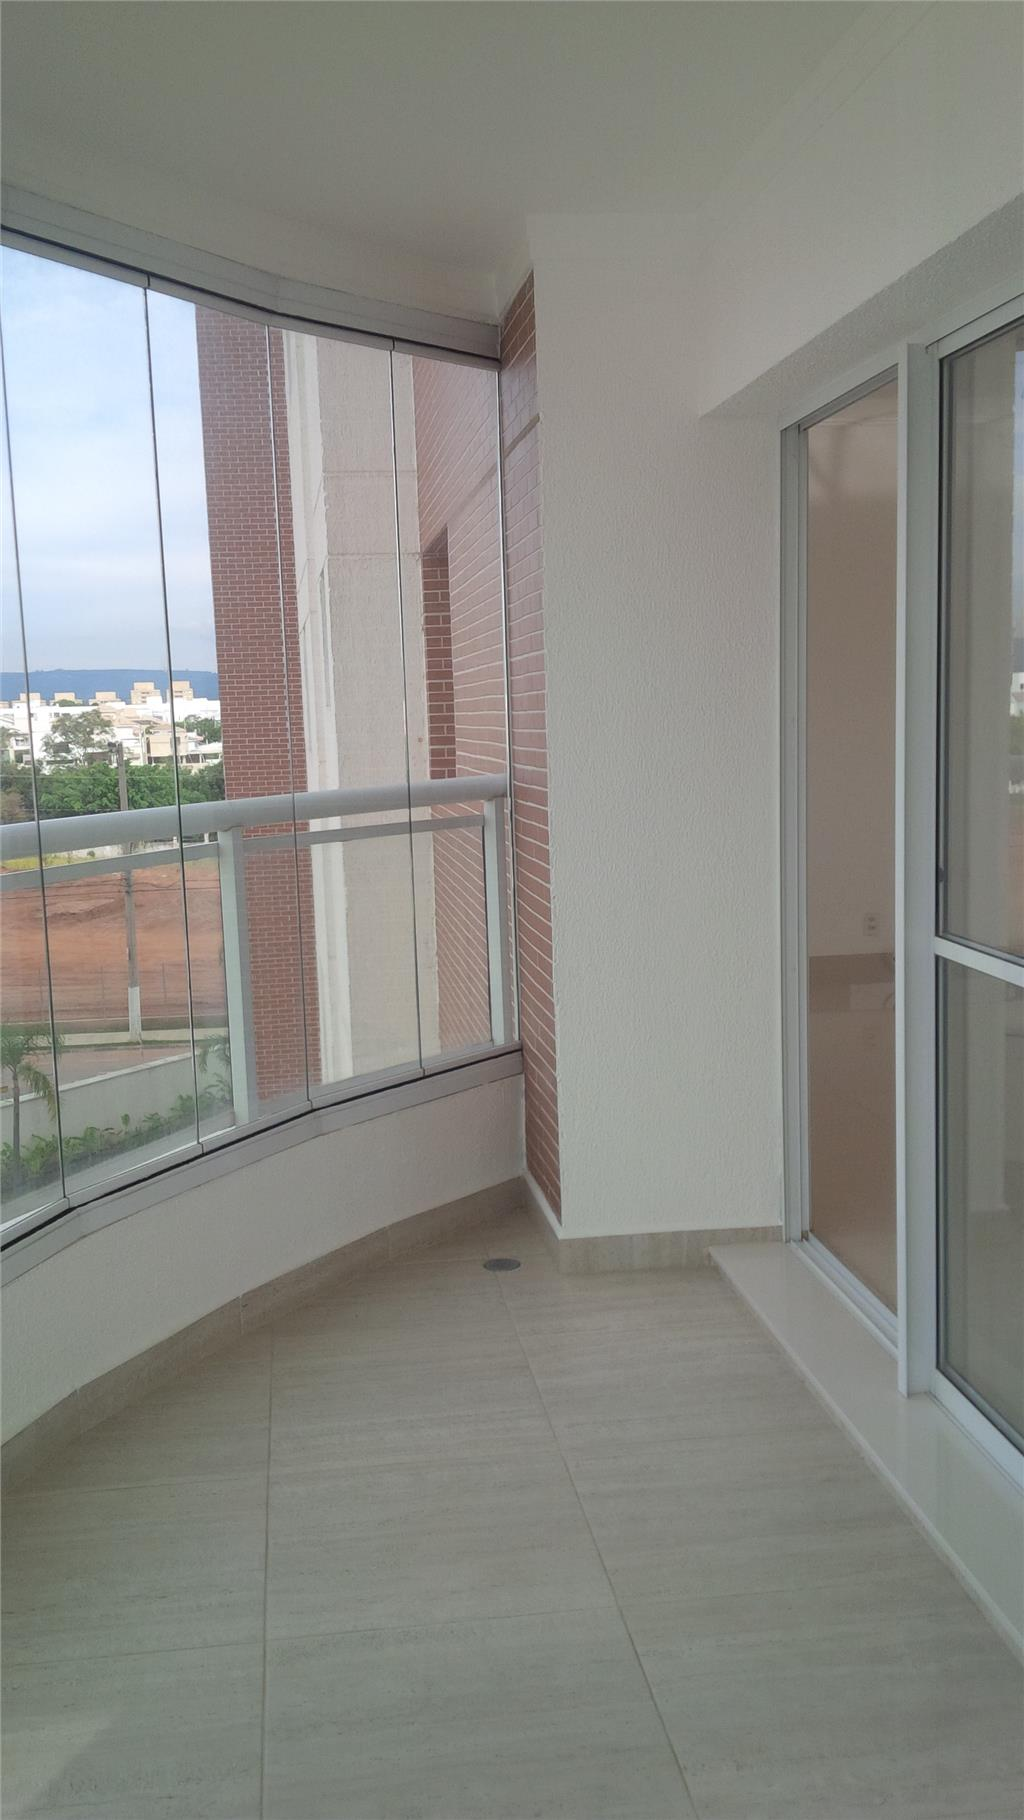 Apto 4 Dorm, Campolim, Sorocaba (474256) - Foto 4